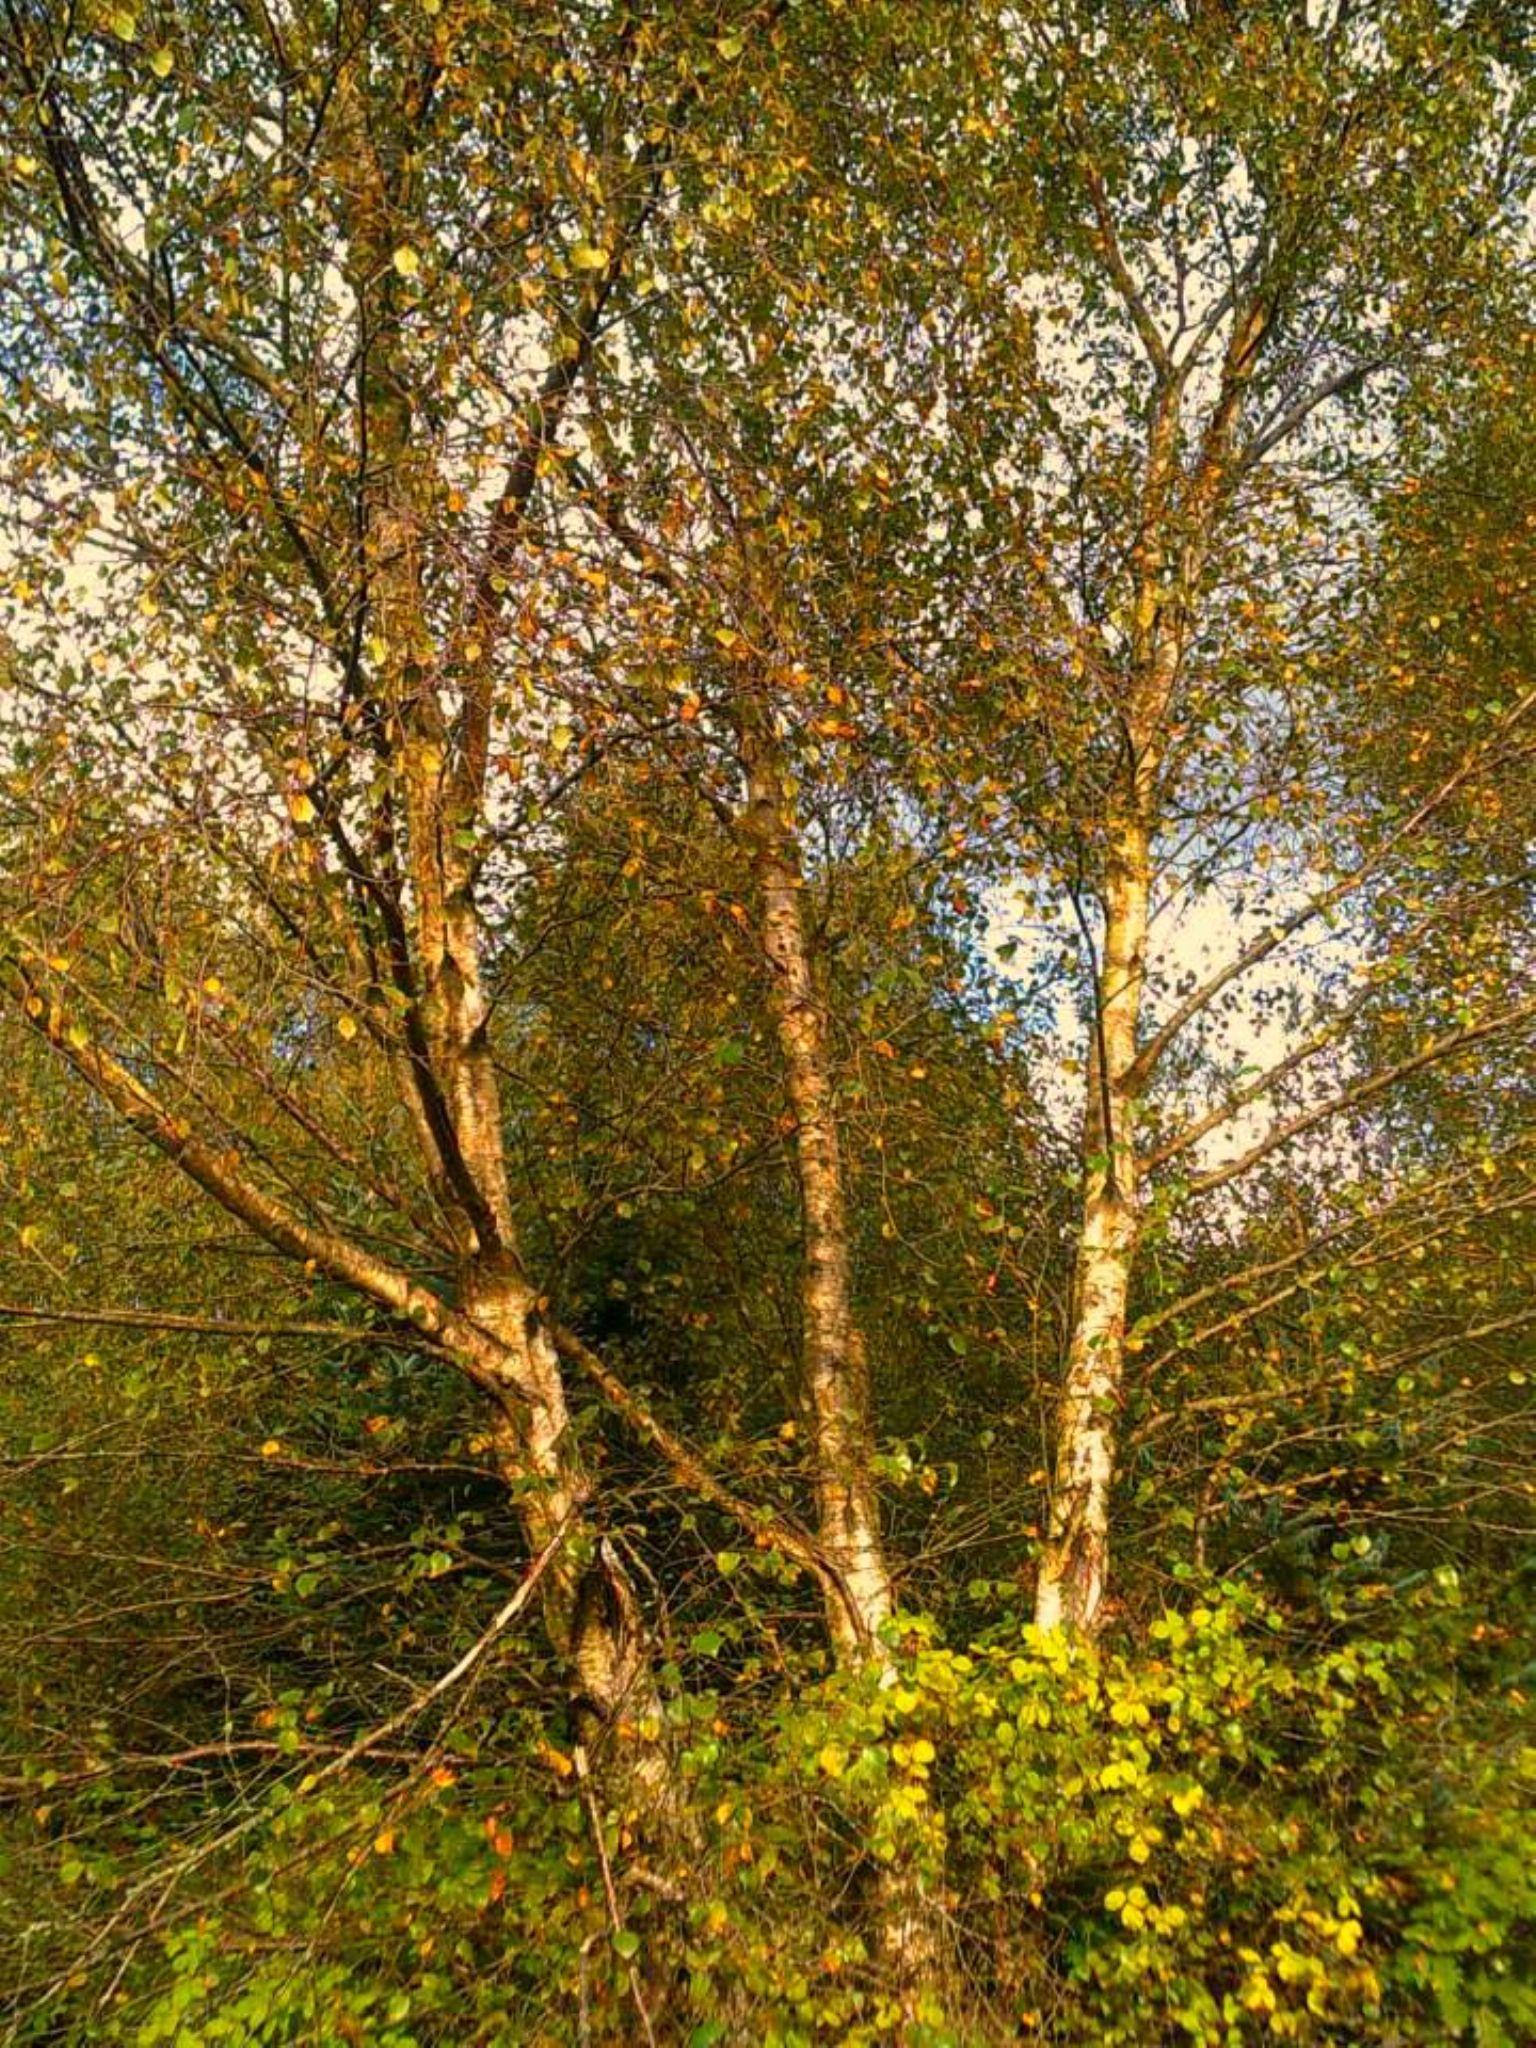 autumn birch trees by chris.adams.3557